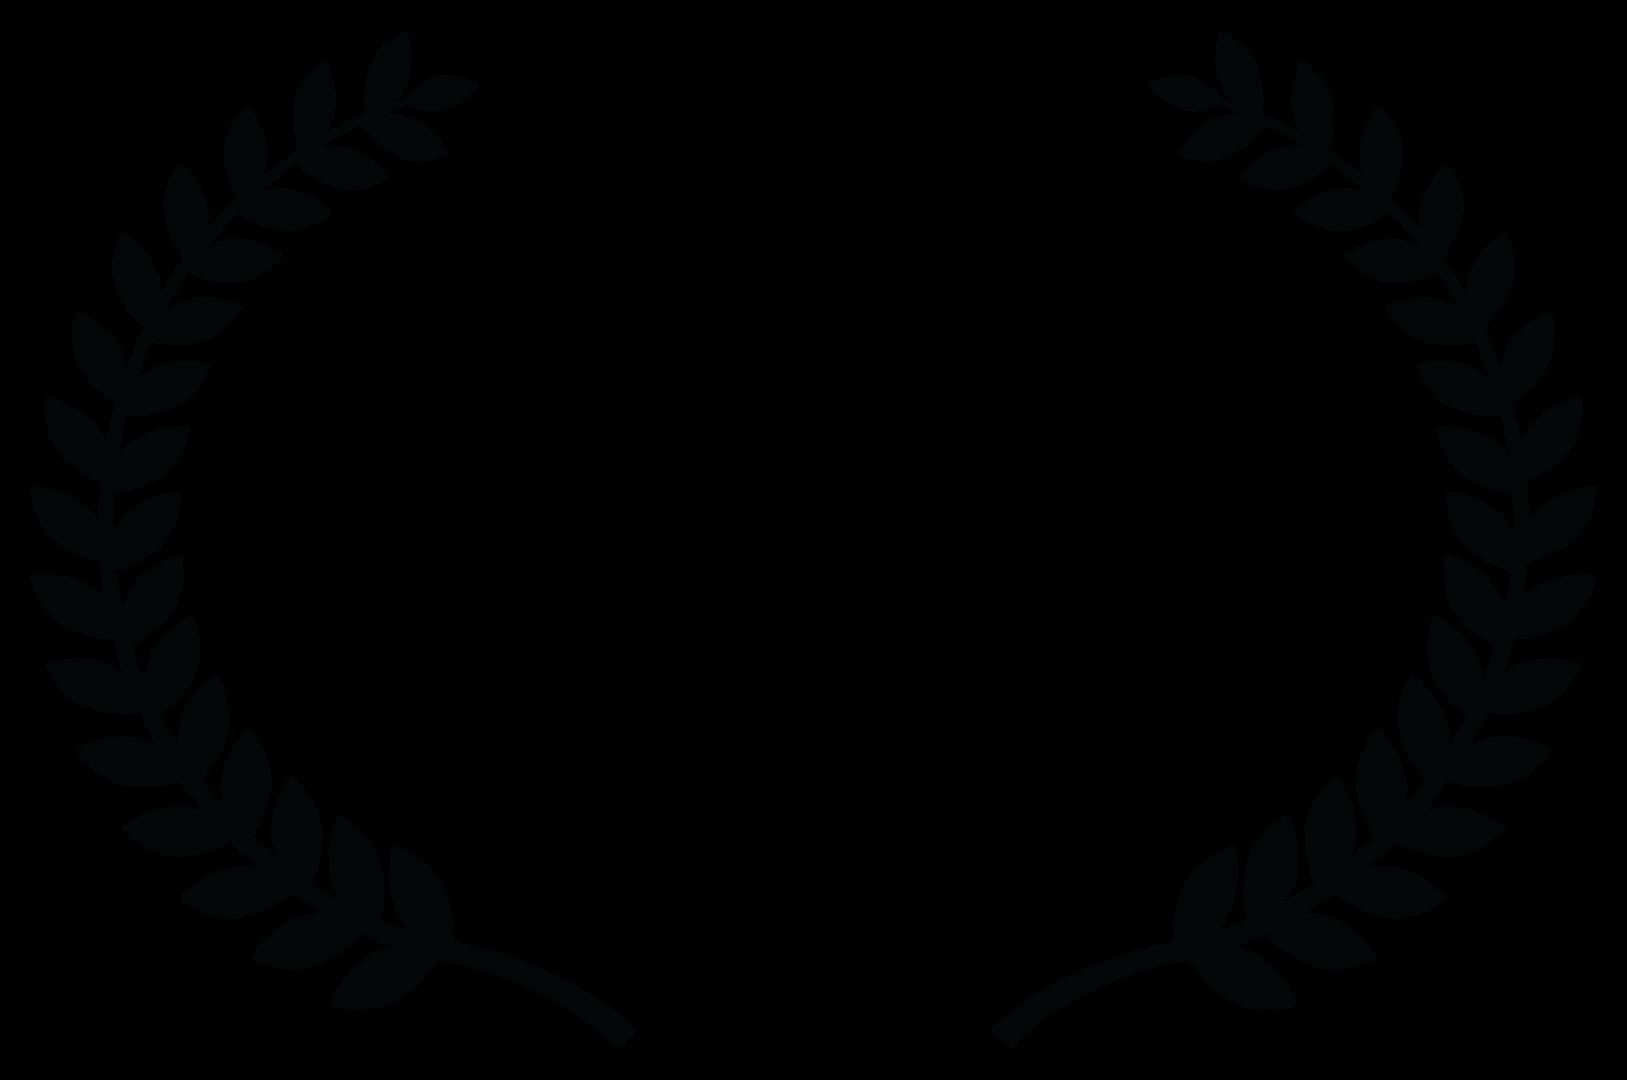 OFFICIAL SELECTION - Roswell Film Festiv